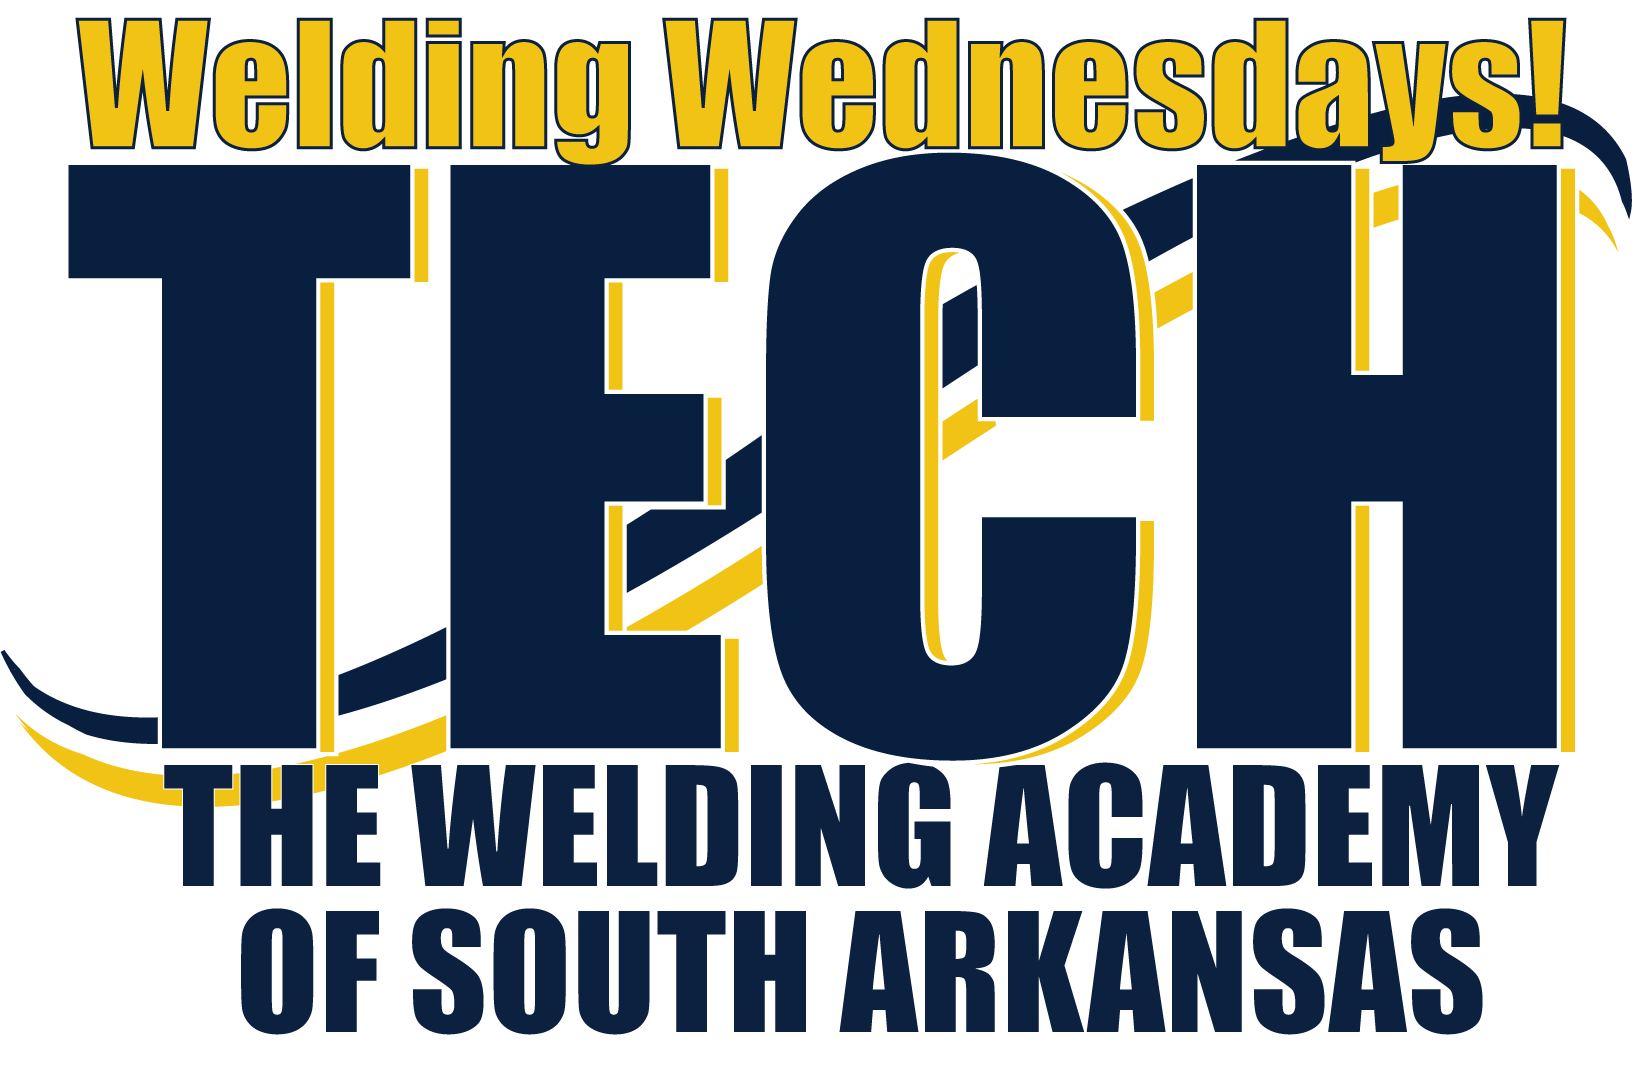 logo for welding wed